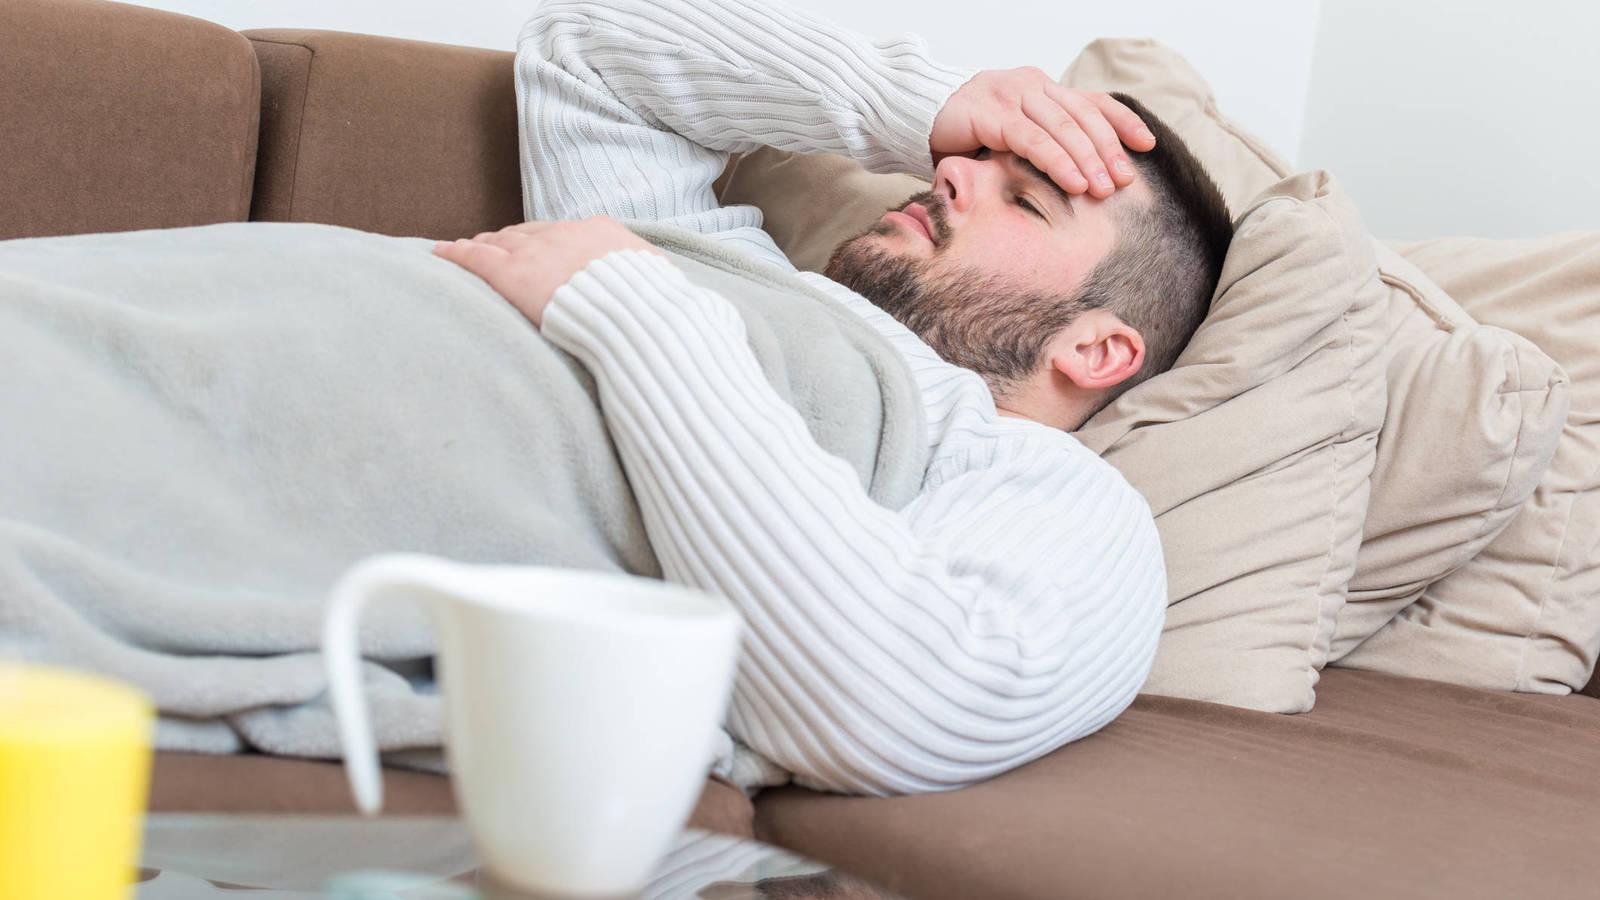 ¿Cómo diferenciar la gripe del COVID-19?